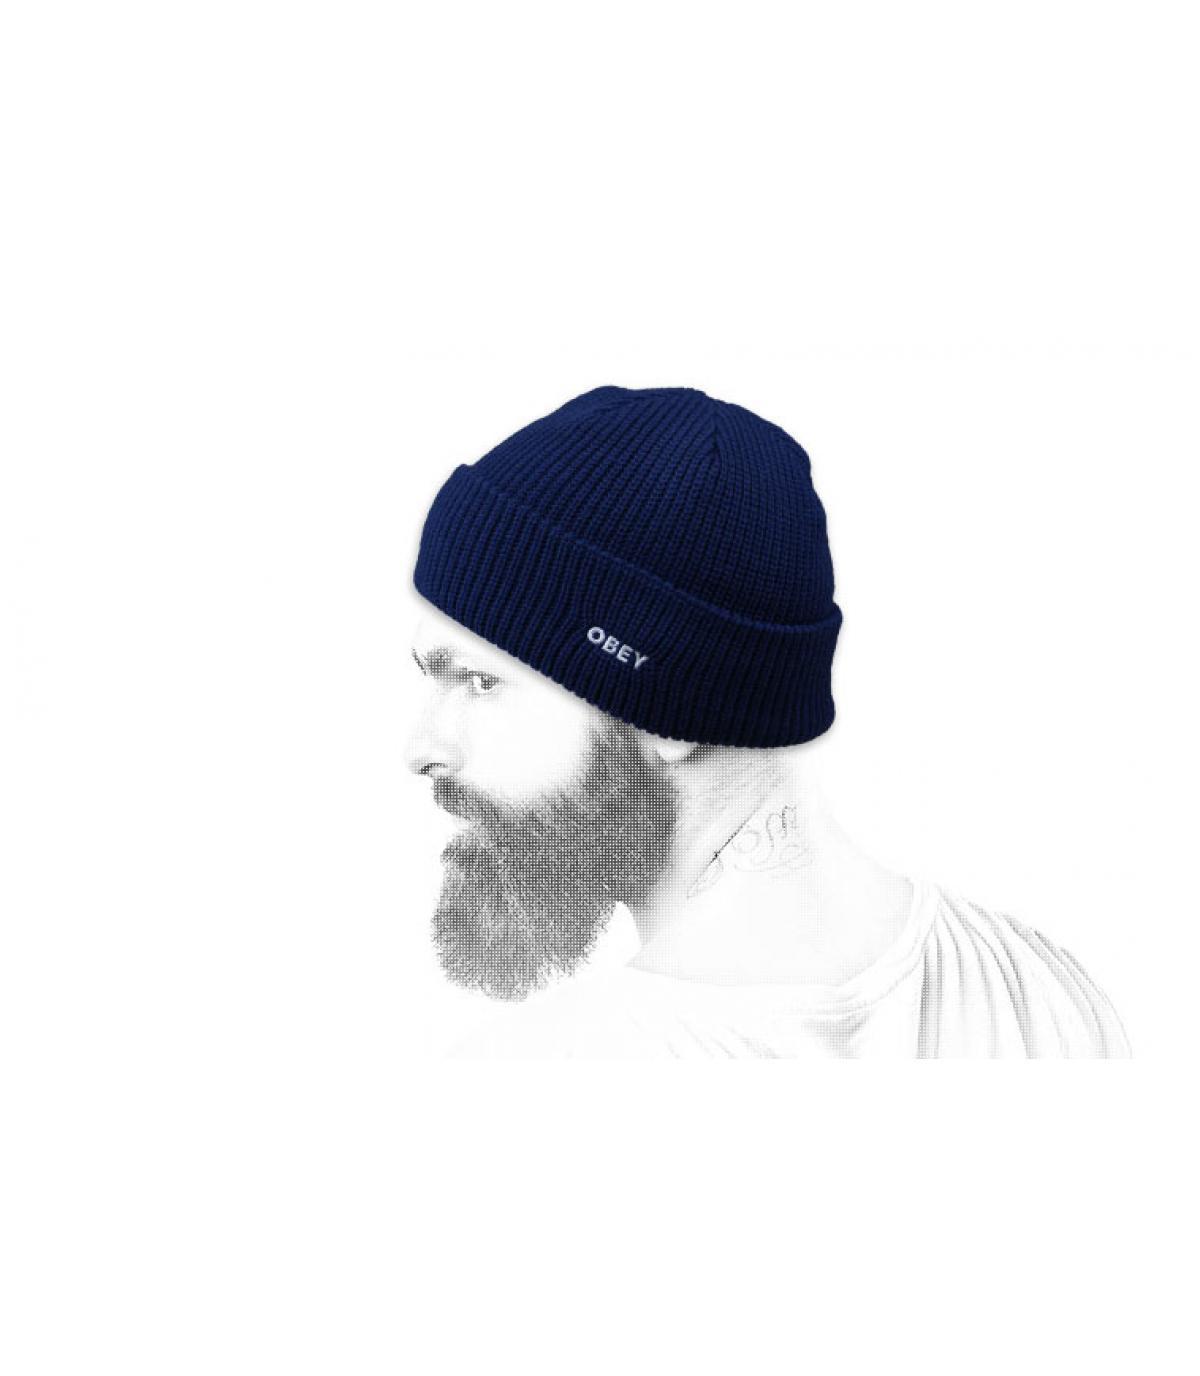 gorra solapa azul Obey